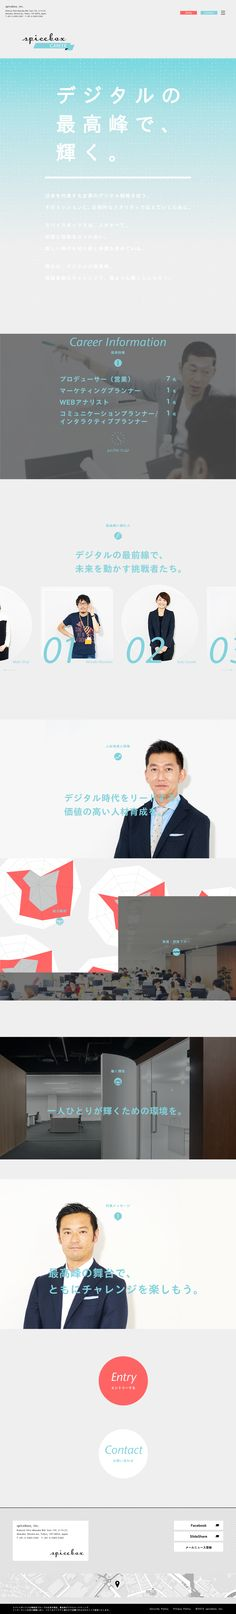 http://www.spicebox.co.jp/career/